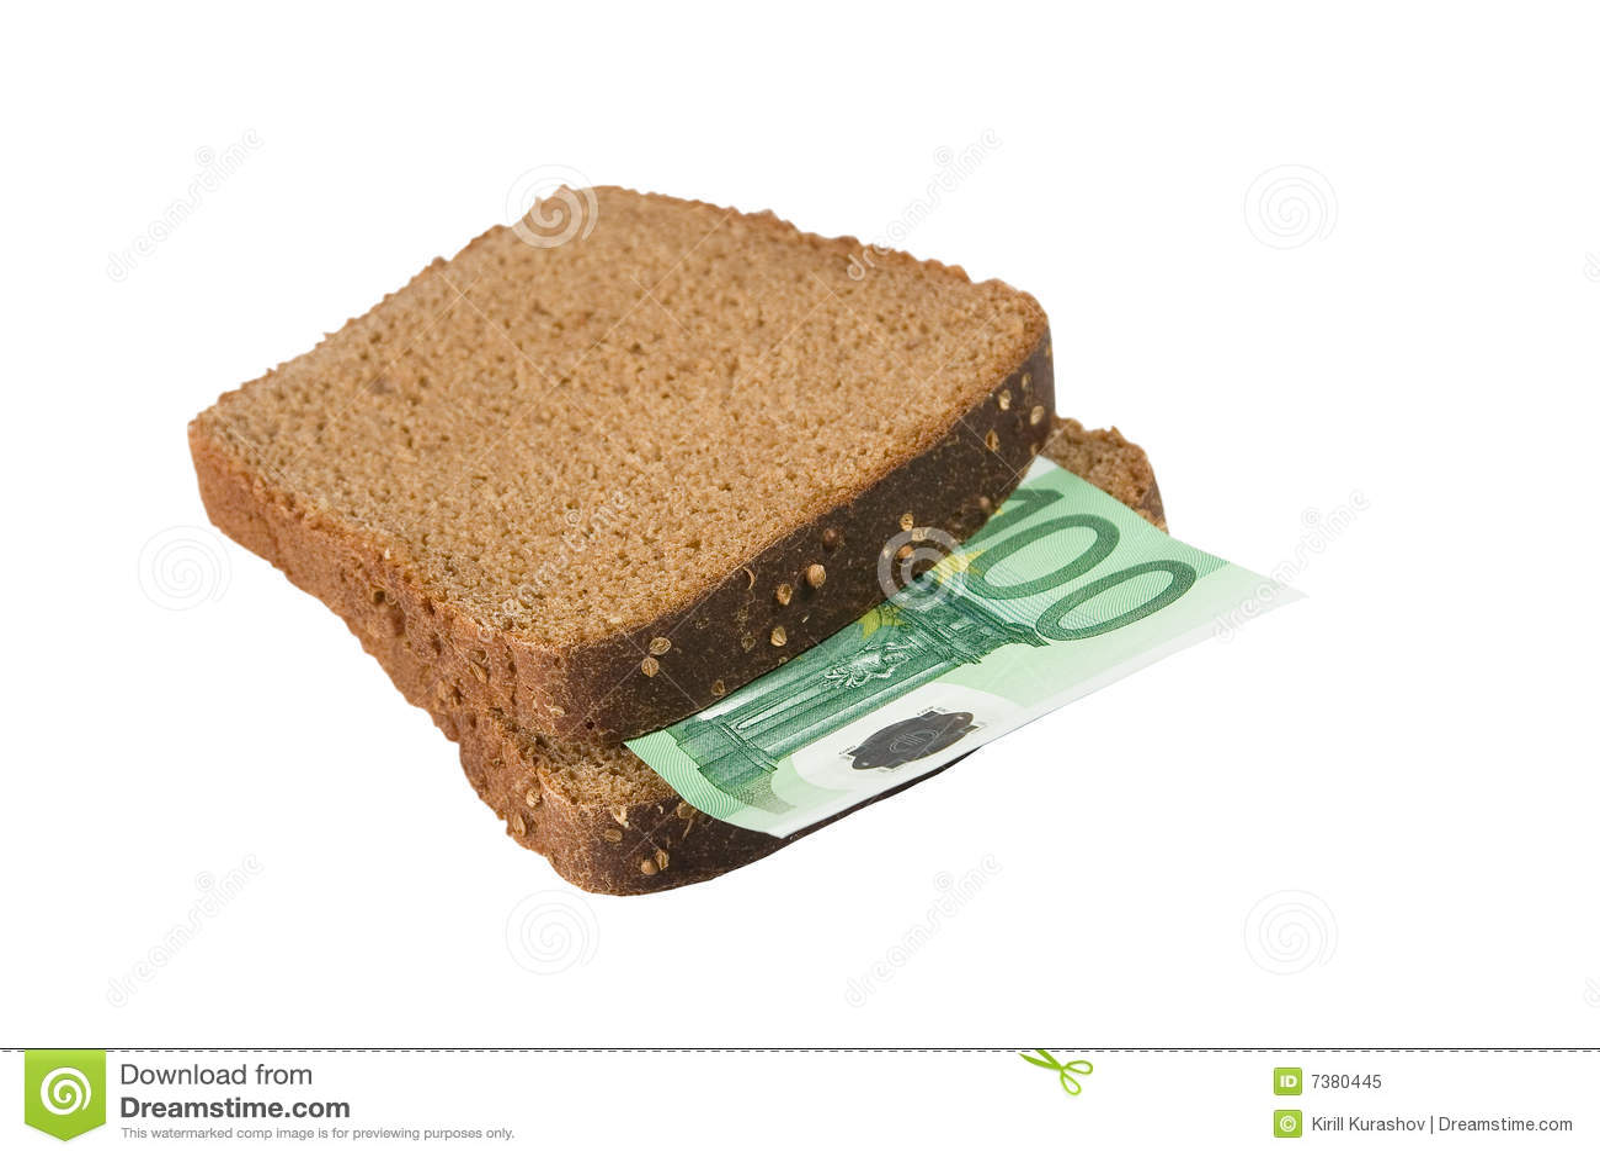 Euro bill between slices of bread